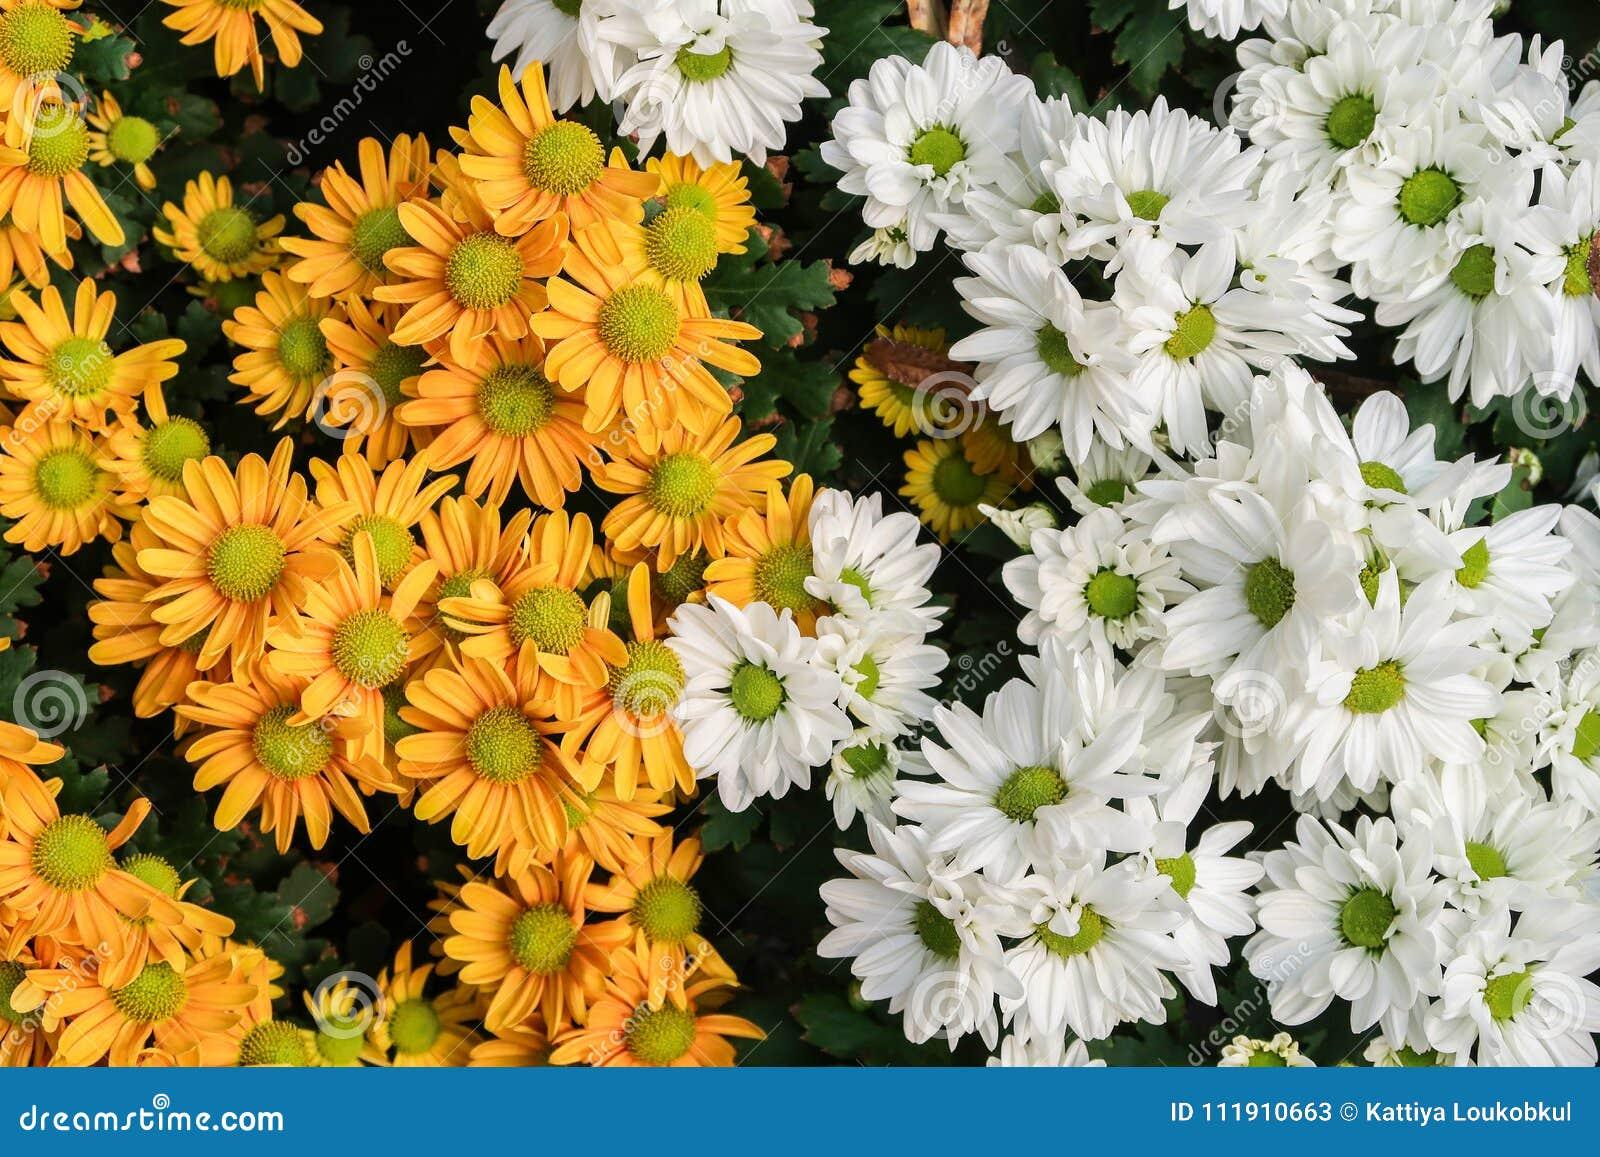 White and yellow chrysanthemum or daisies flowers stock image download comp izmirmasajfo